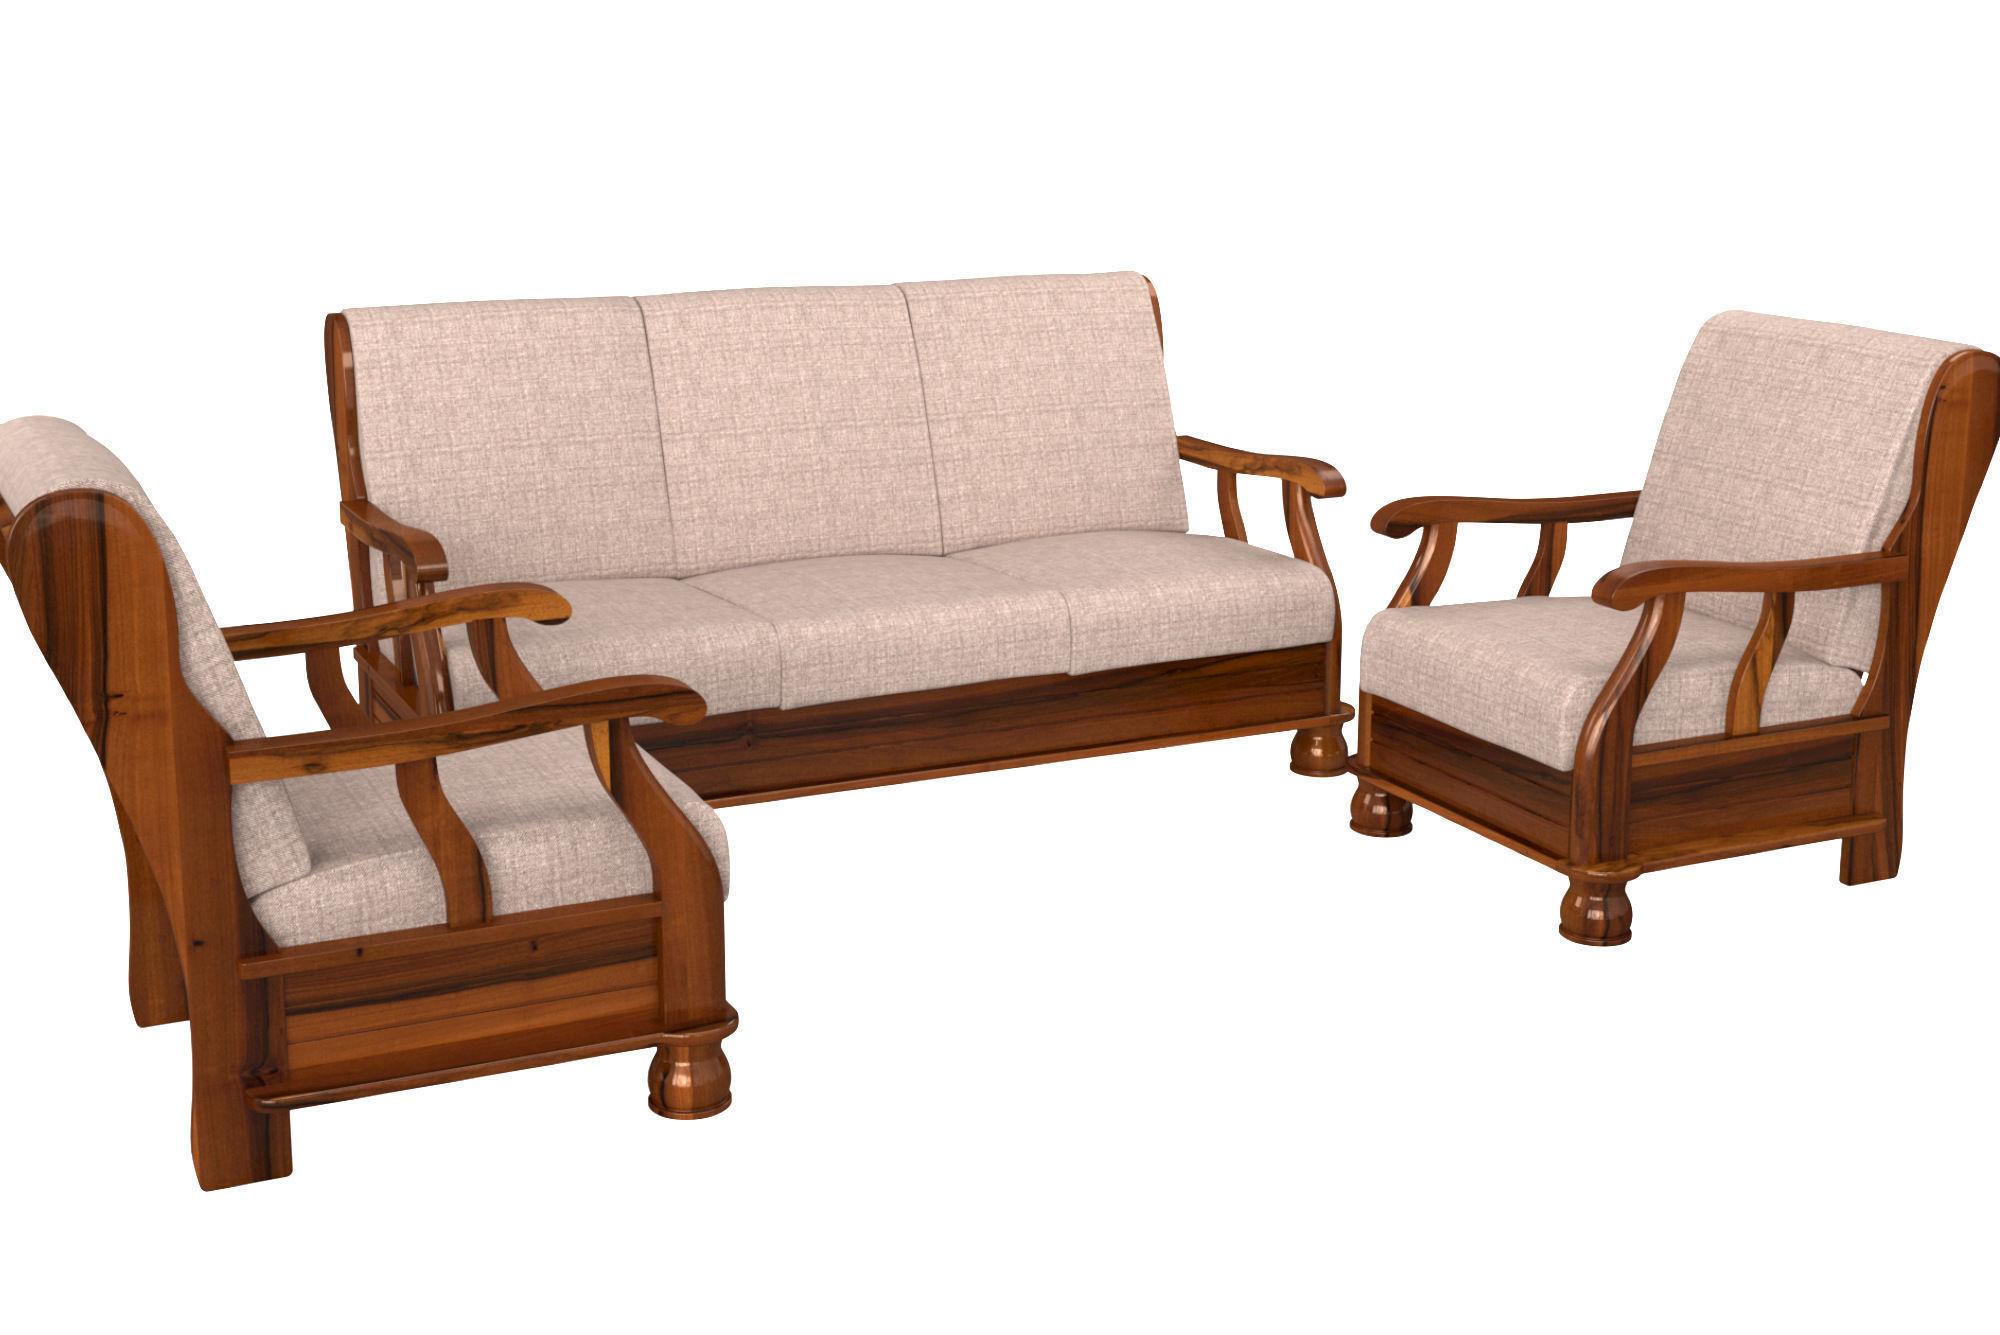 3D RoyalOak furniture Zita sofa armchair set | CGTrader